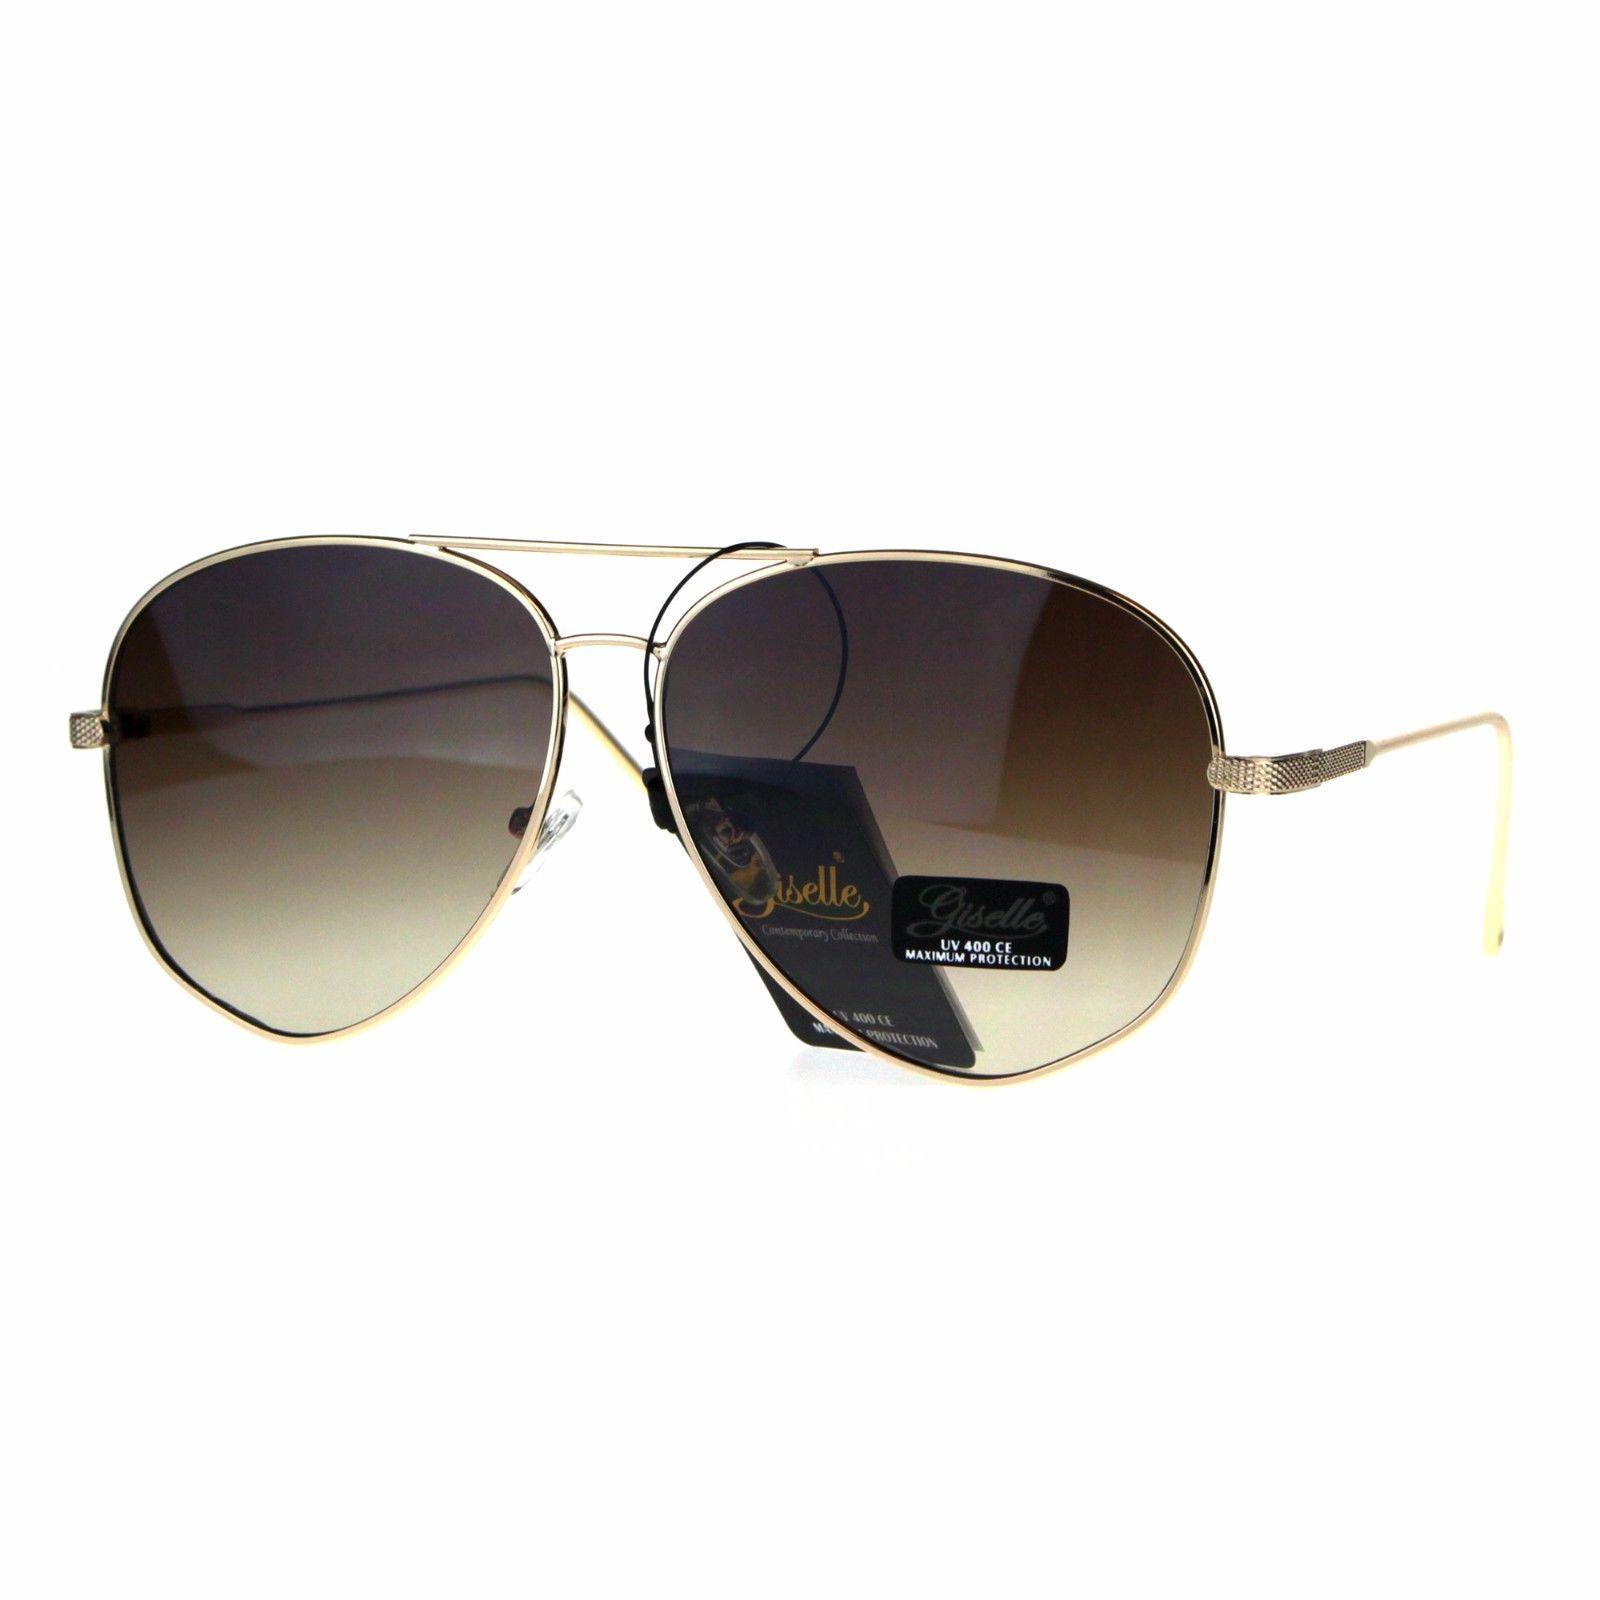 Giselle Womens Oversize Designer Fashion Pilots Metal Rim Sunglasses